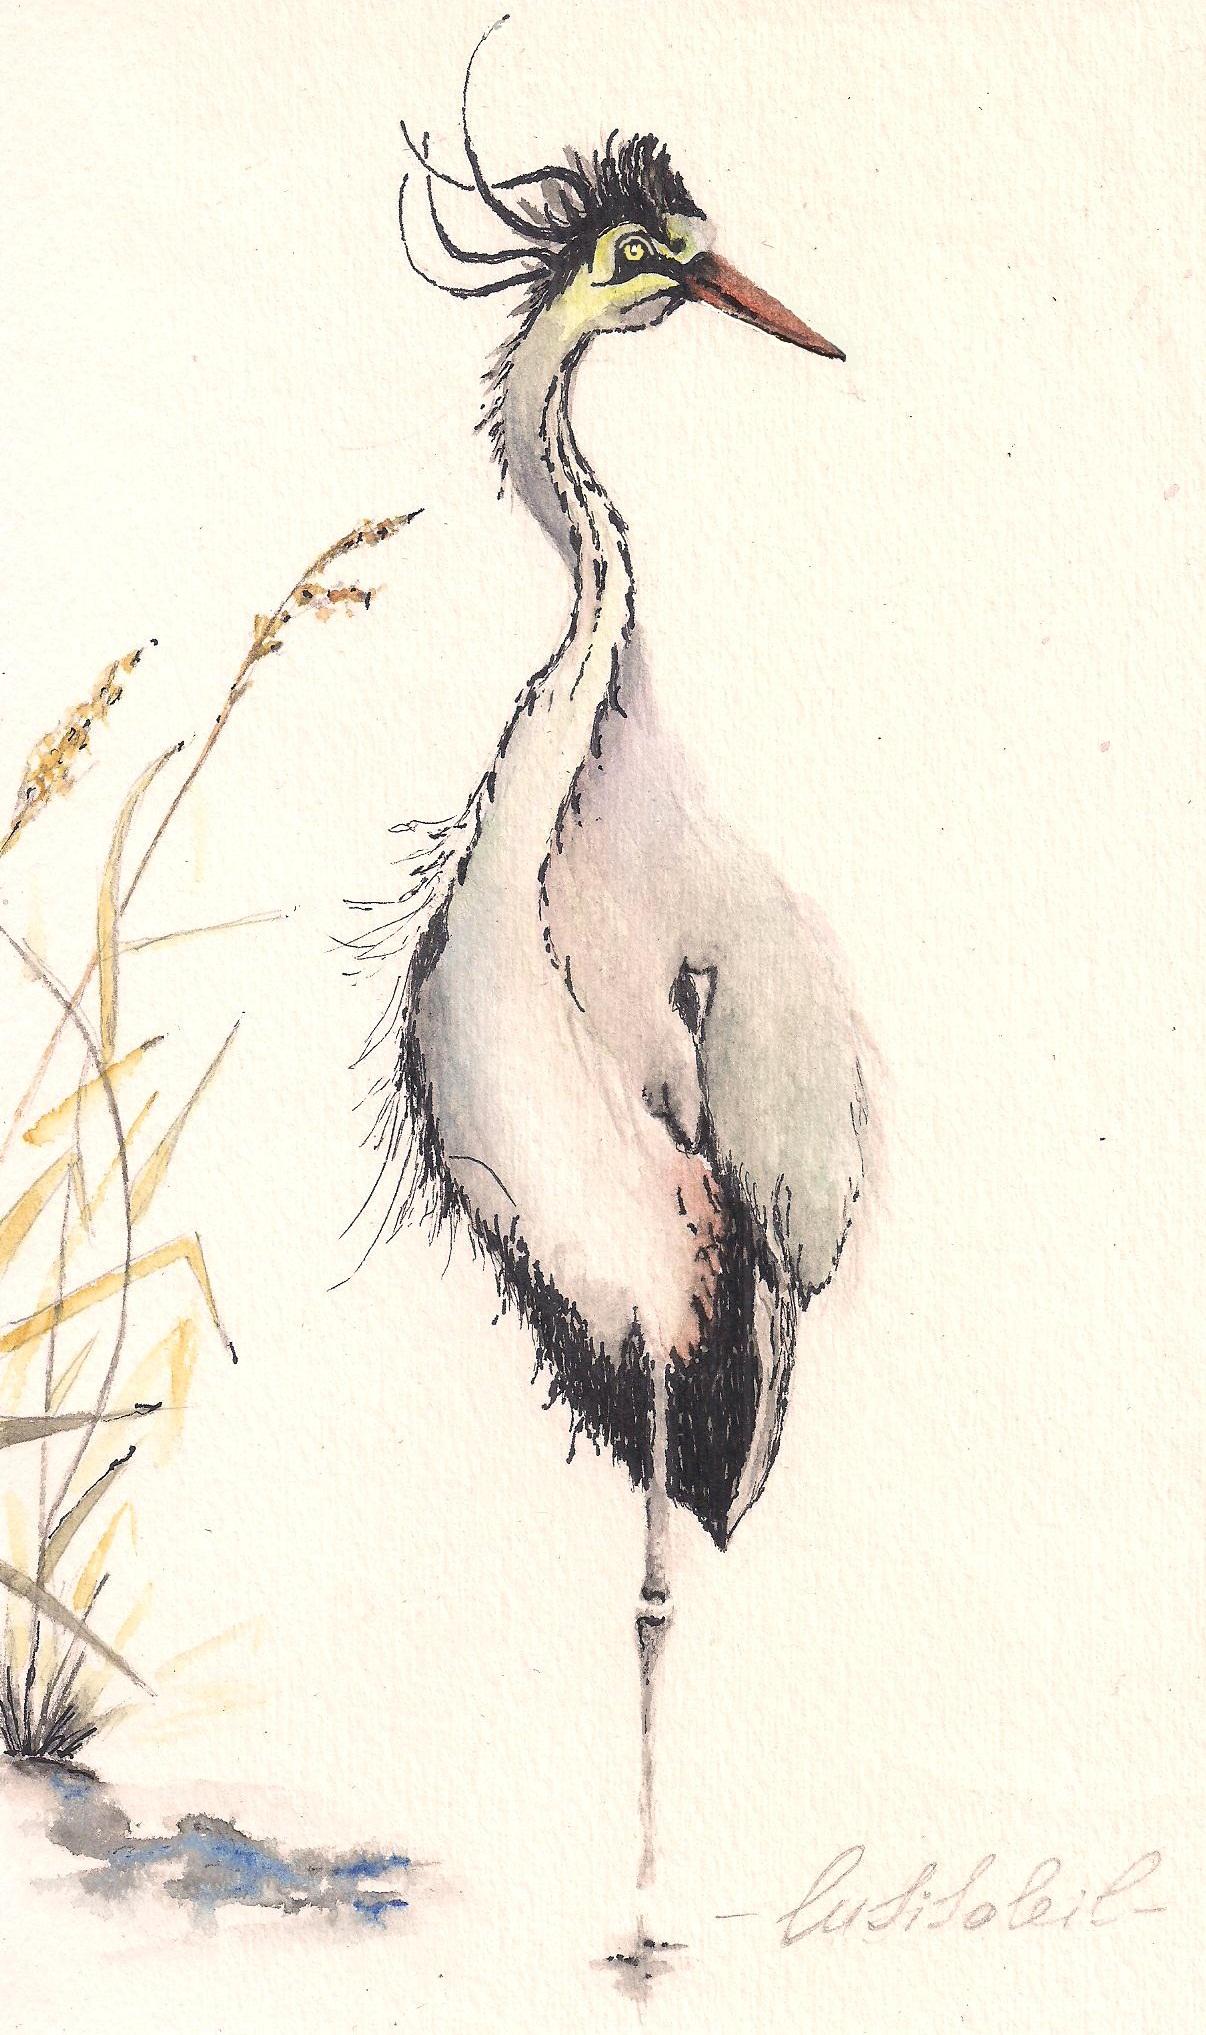 Птица.Бумага.Акварель.*Lusi Soleil*#watercolor#watercolour*Lusi Soleil*#❤люблюмалювати❤люблюакварель❤❤малююзавжди❤#watercolor#watercolour*Lusi Soleil*##watercolor#watercolour*